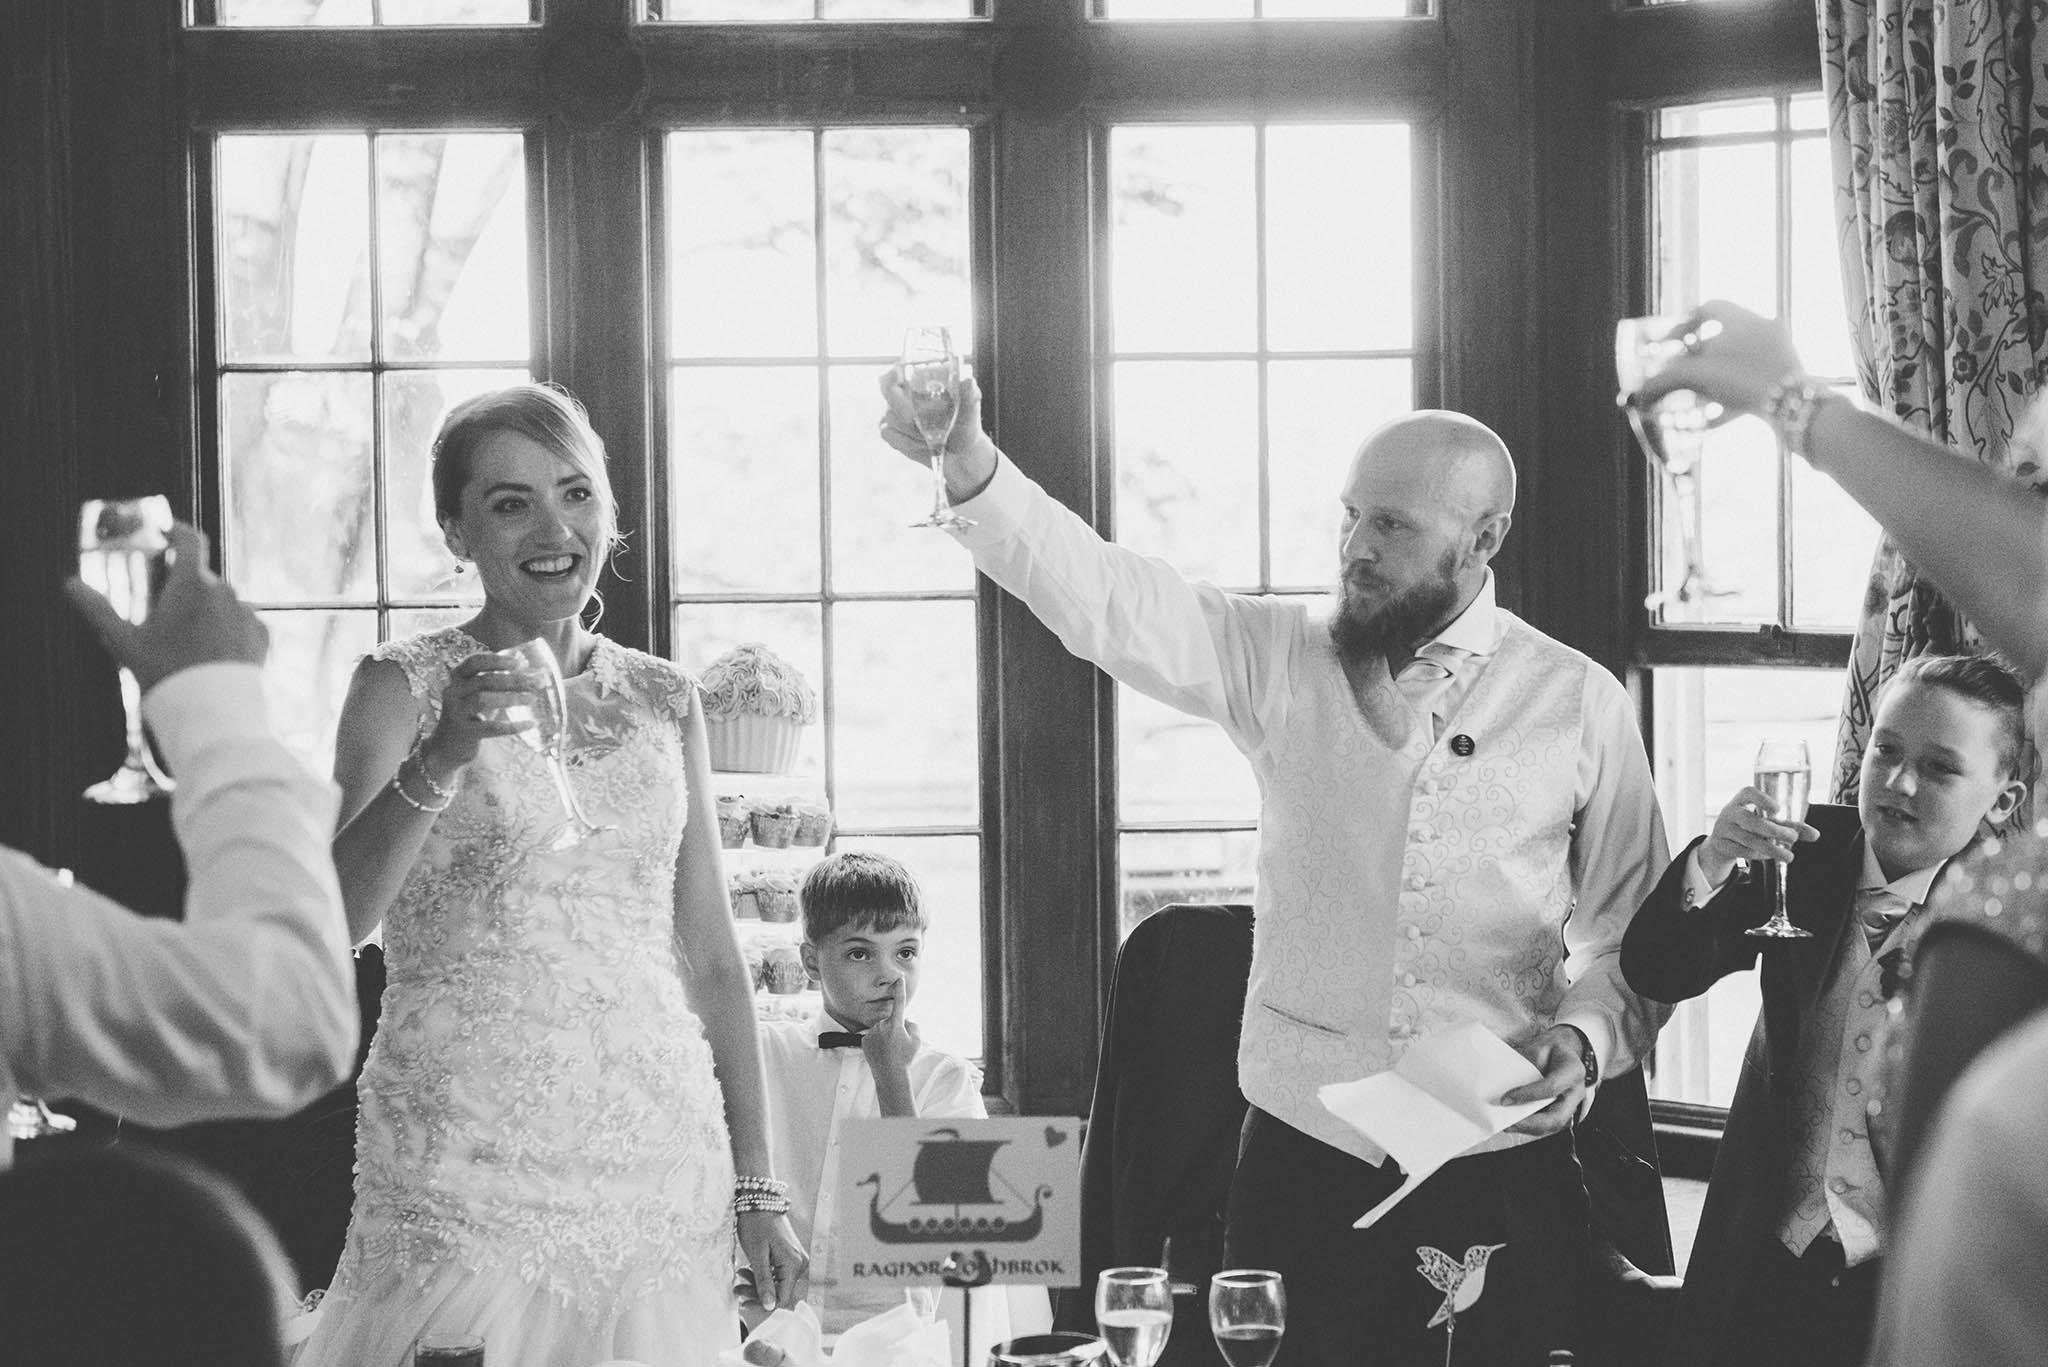 mark-fran-wedding-dumbleton-hall-scott-stockwell-photography.jpg